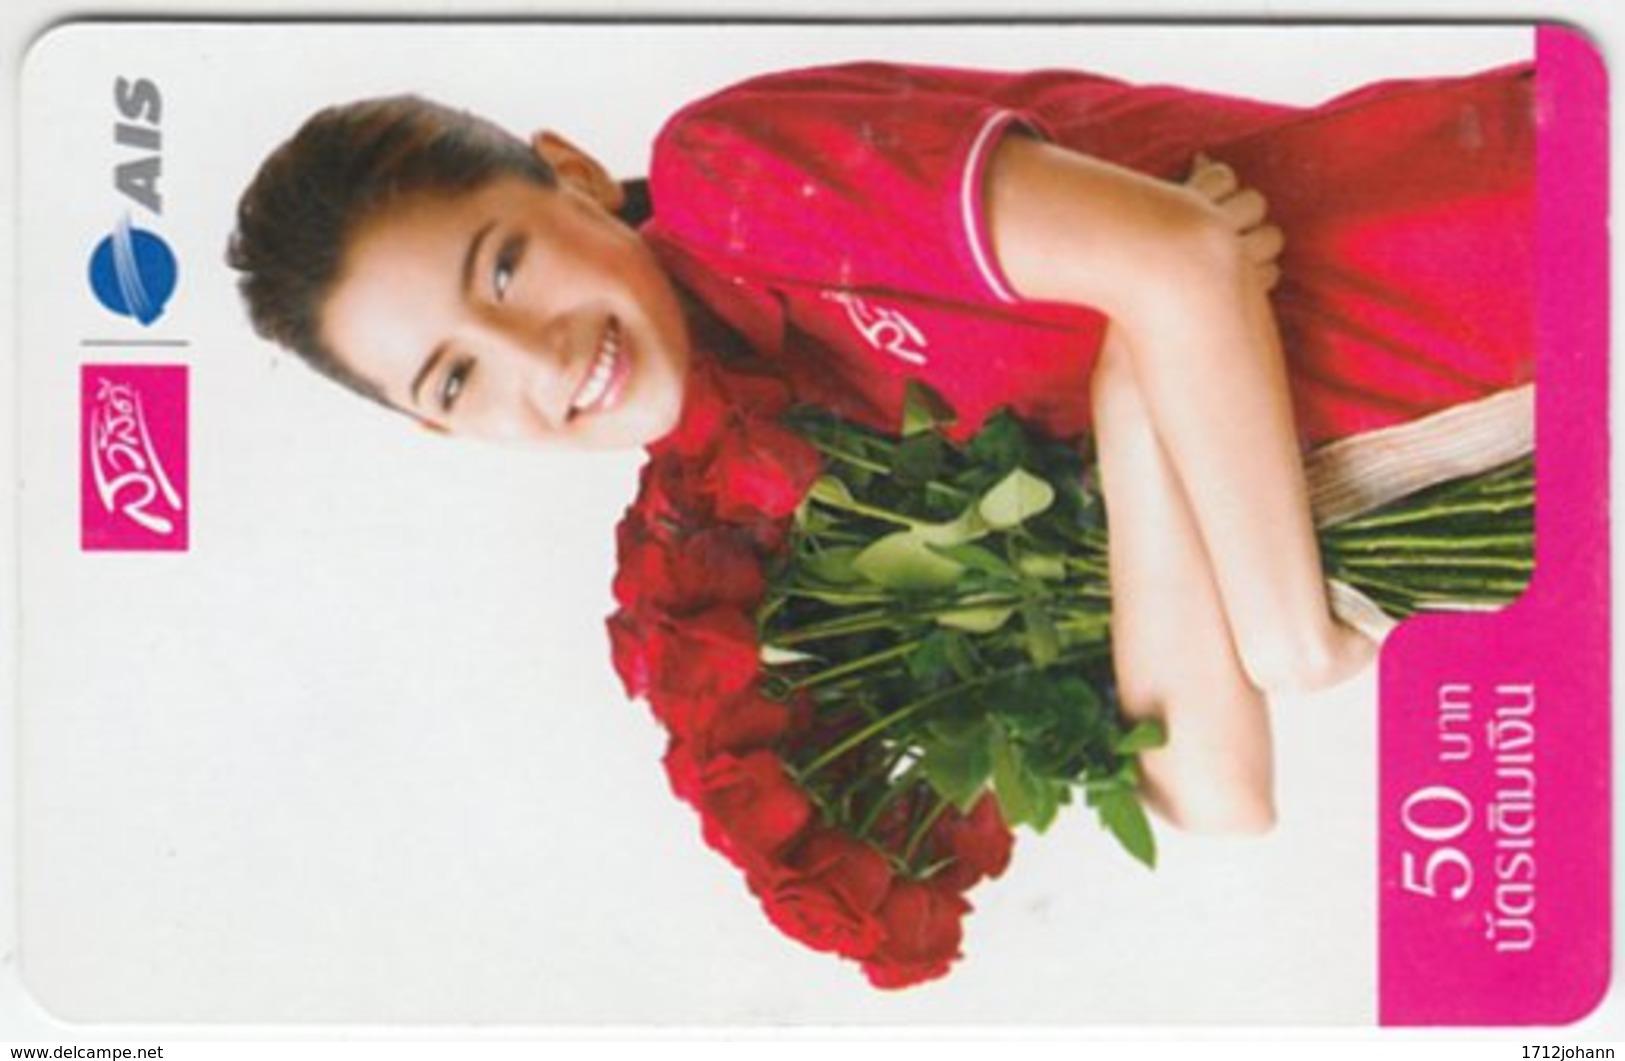 THAILAND C-832 Prepaid 1-2-call/AIS - People, Woman, Plant, Flower, Rose - Used - Thaïland